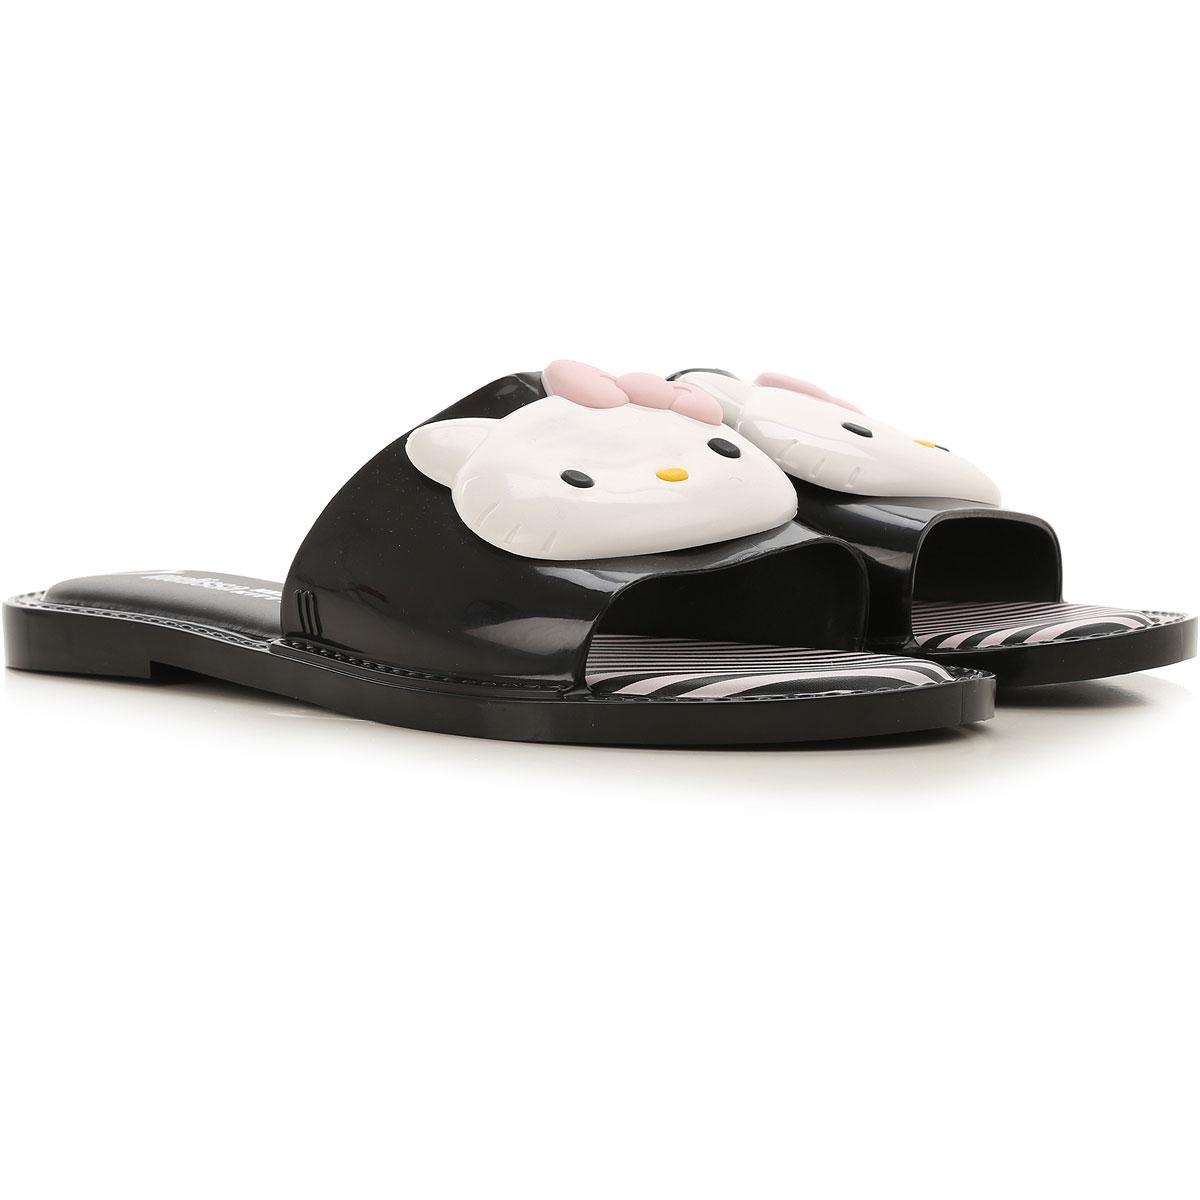 Melissa Sandals for Women On Sale, Melissa + Hello Kitty, Black, PVC, 2019, USA 5 - EUR 35/36 USA 6 - EUR 37 USA 7 - EUR 38 USA 8 - EUR 39 USA 9 - EUR